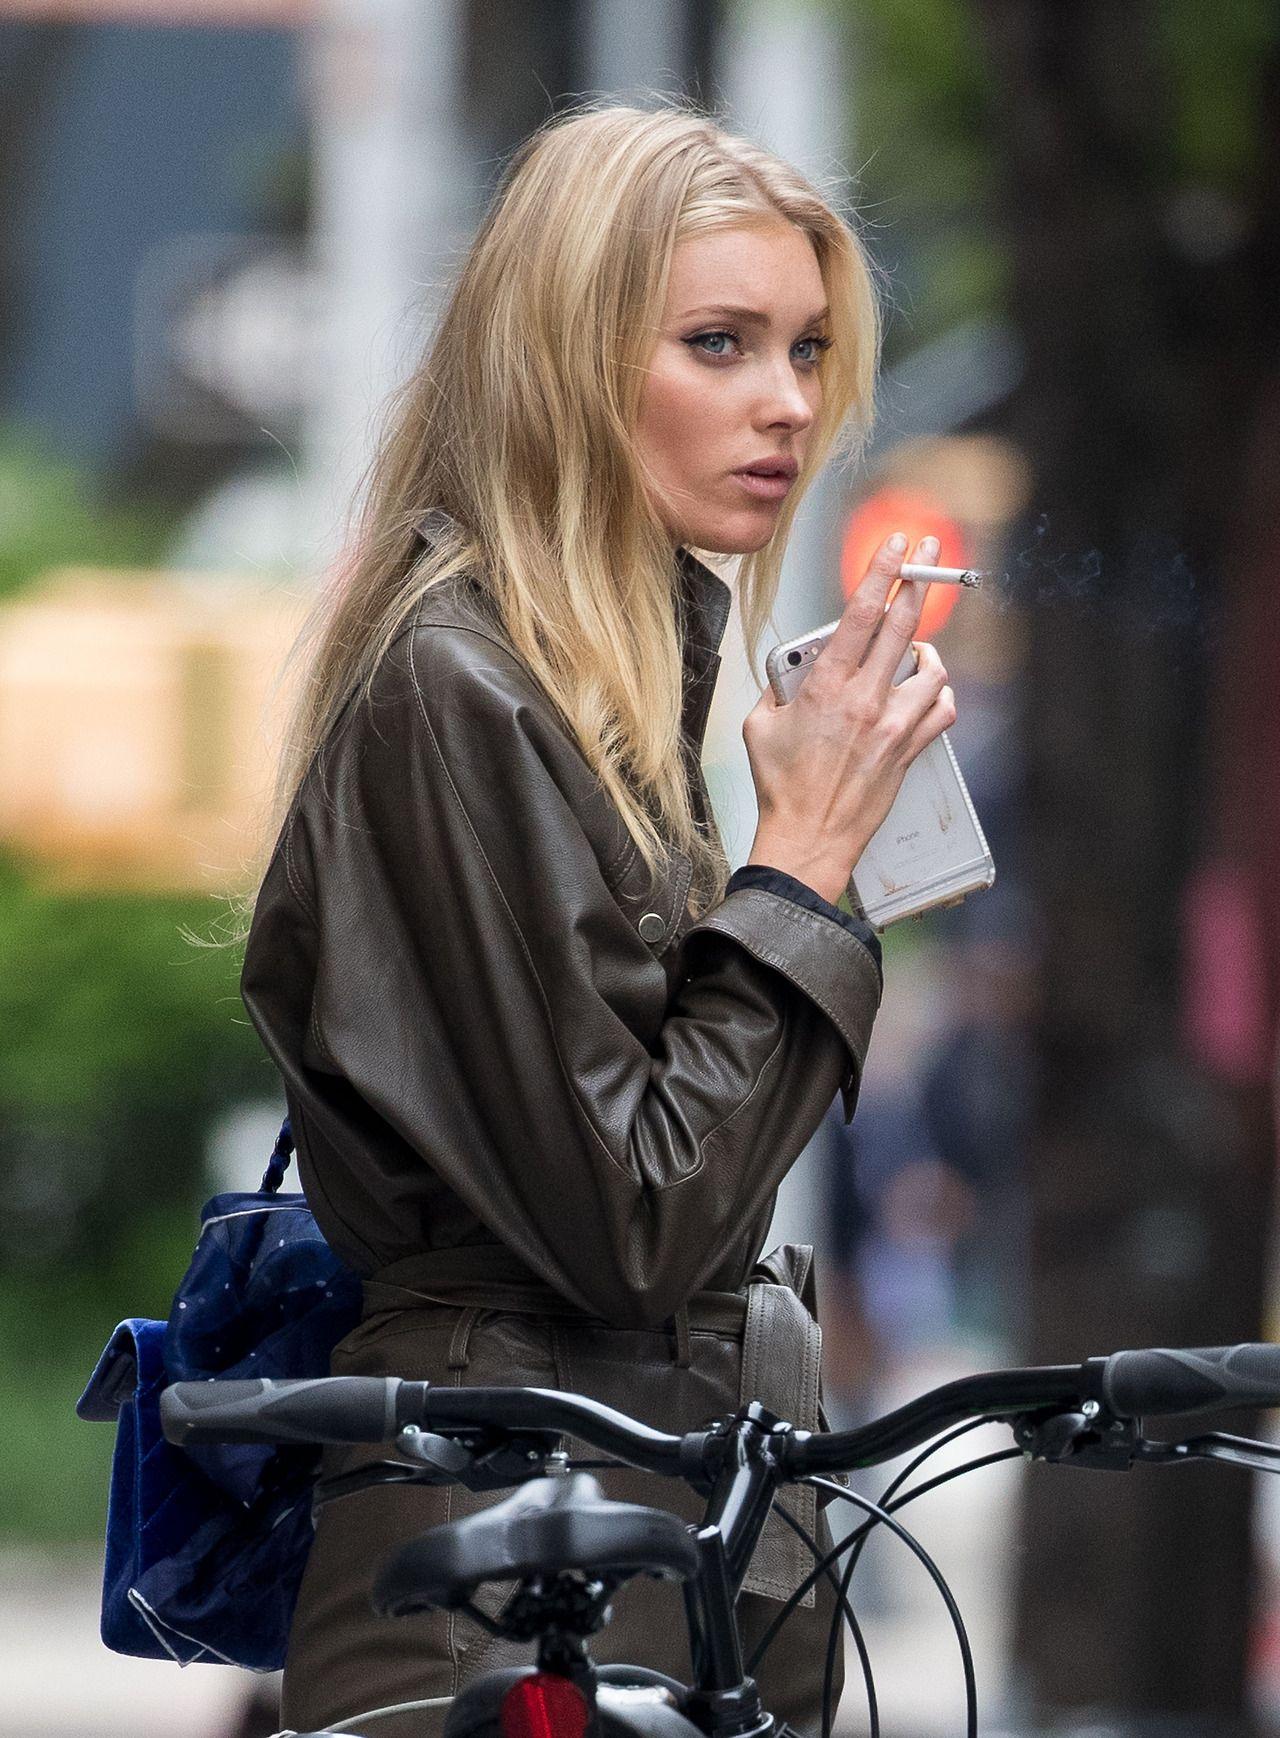 Remarkable, celebrity smoking fetish яблочко